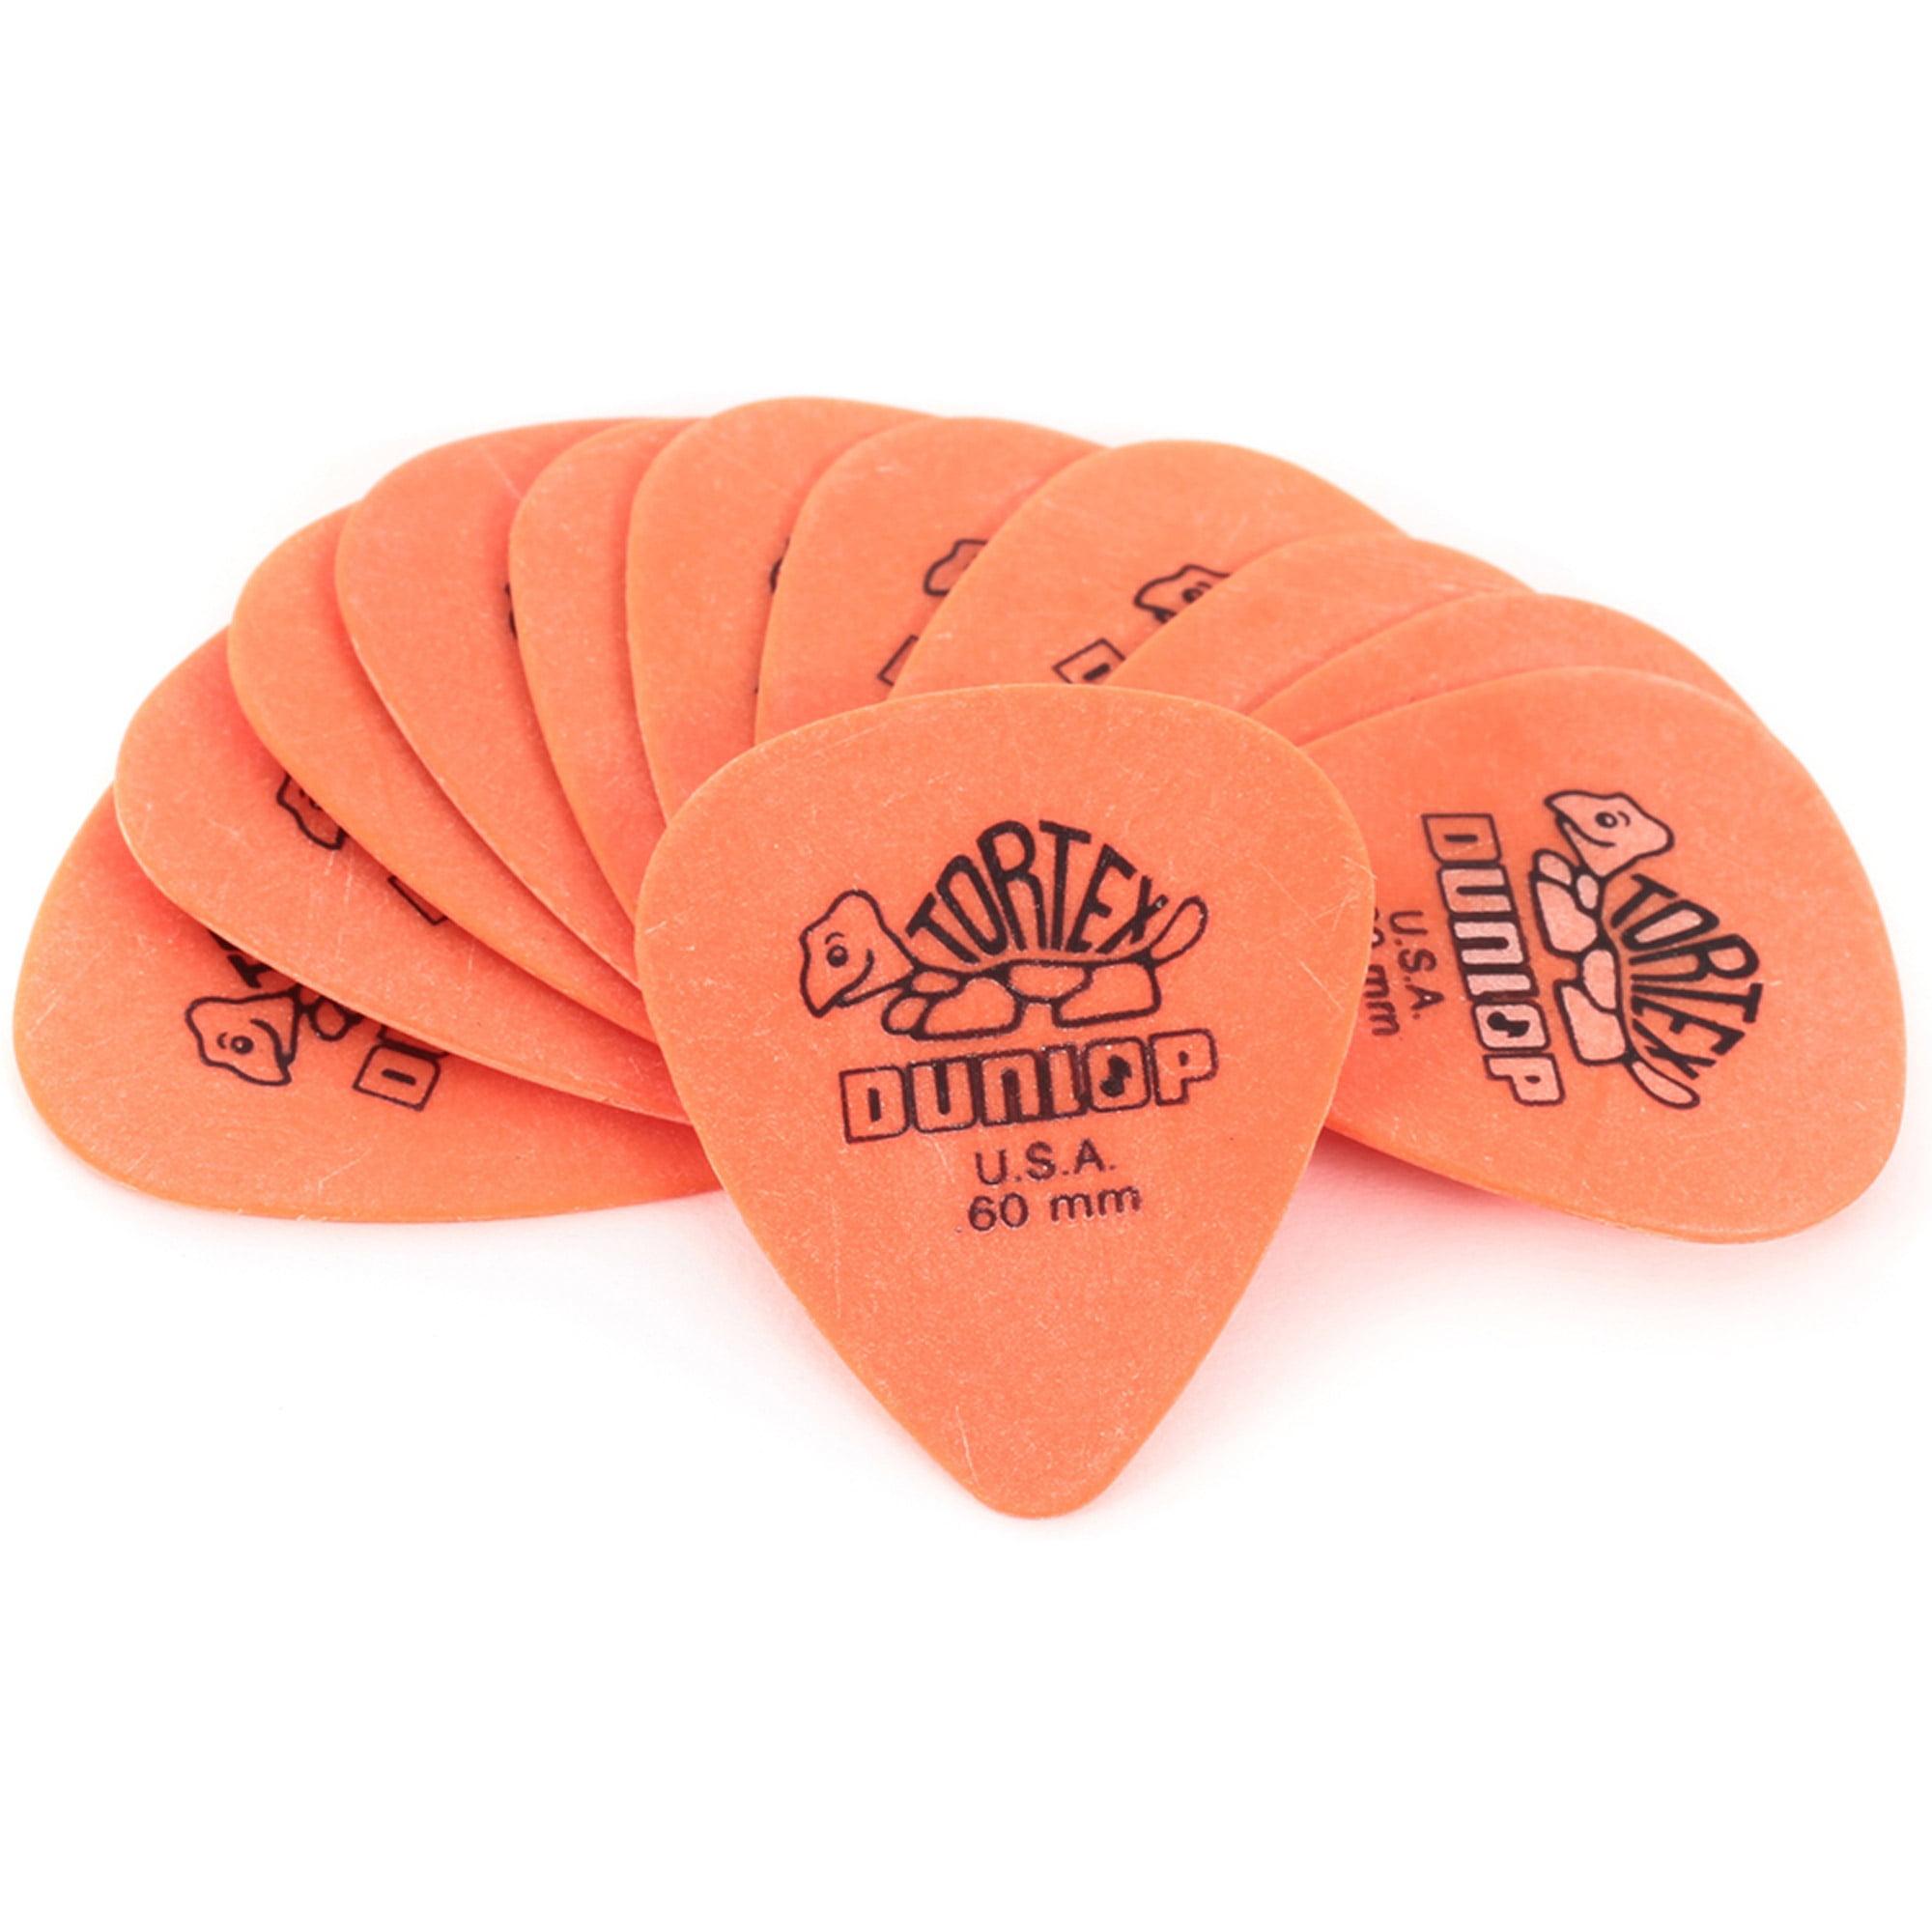 Dunlop Tortex Standard Guitar Picks - 12-Pack - .60mm - Orange